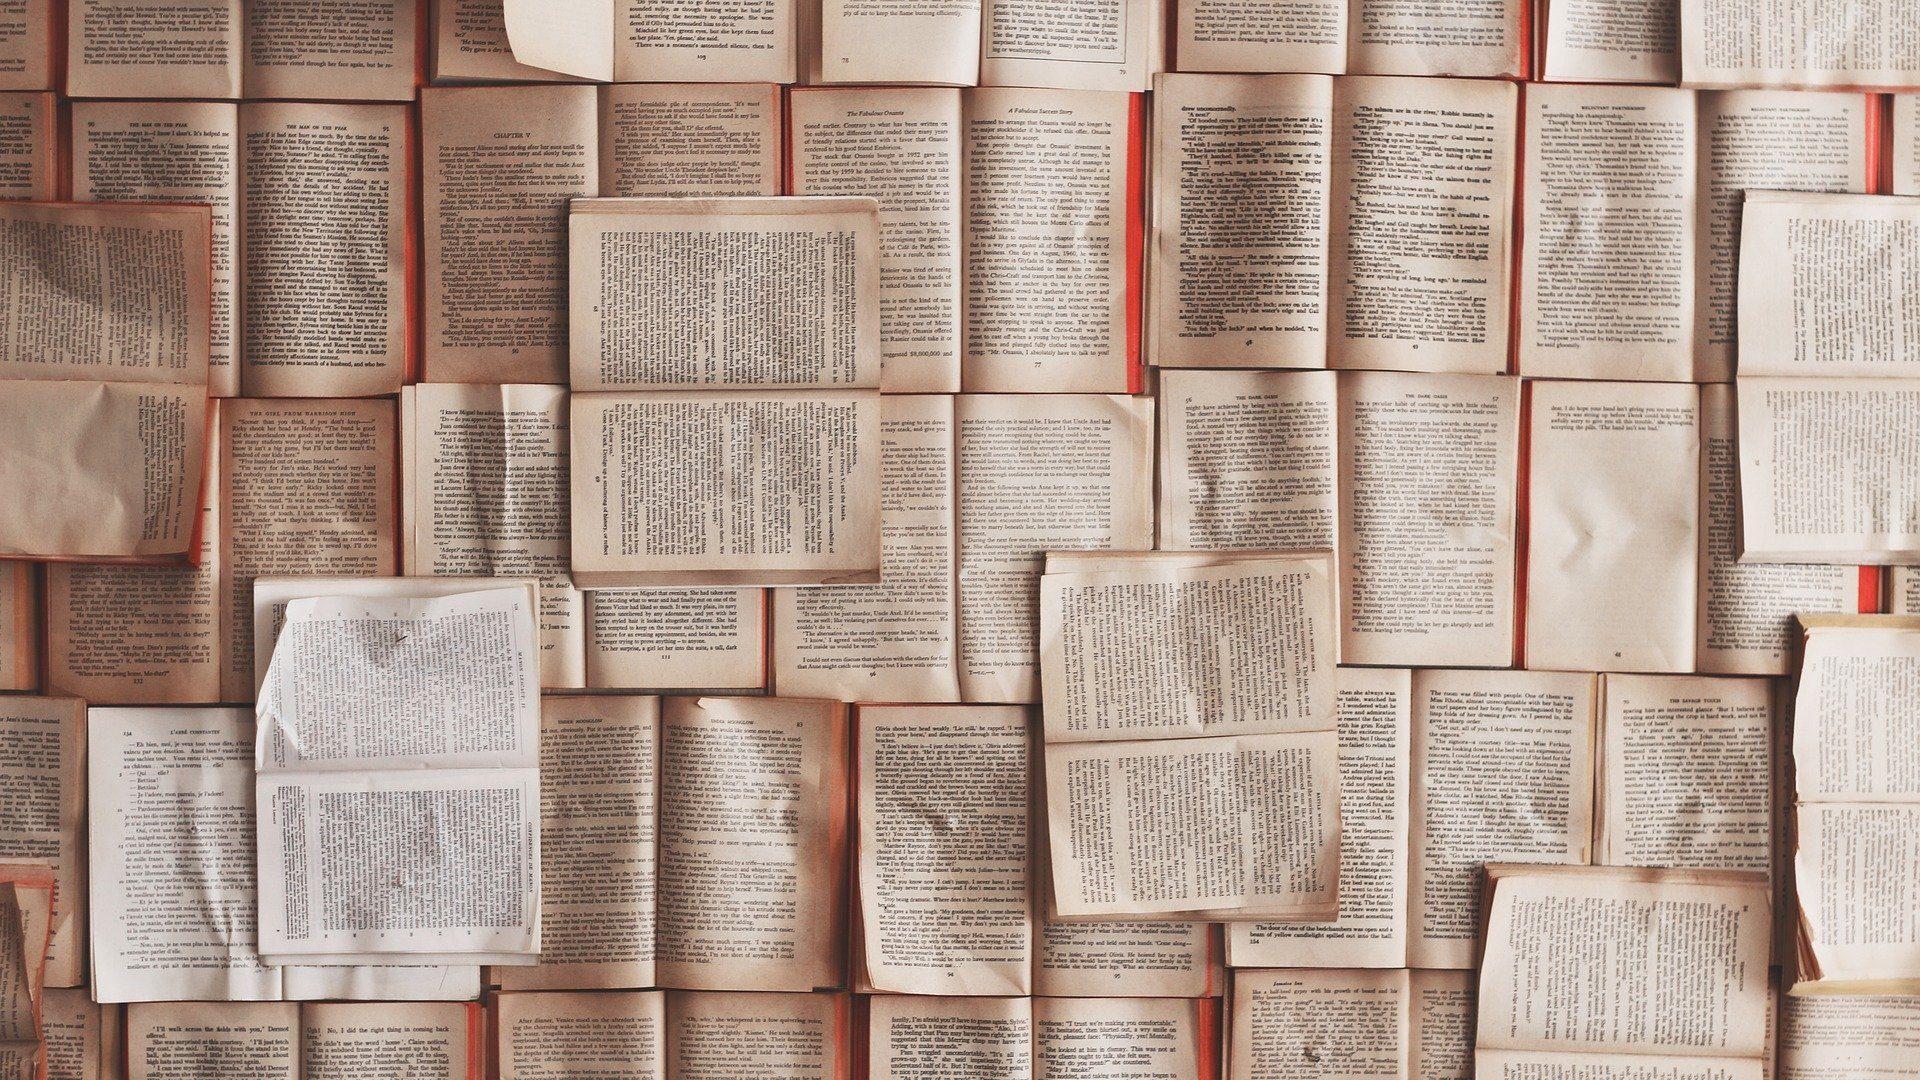 Gaspard Koenig s'introduit dans la bibliothèque de Mario Vargas Llosa